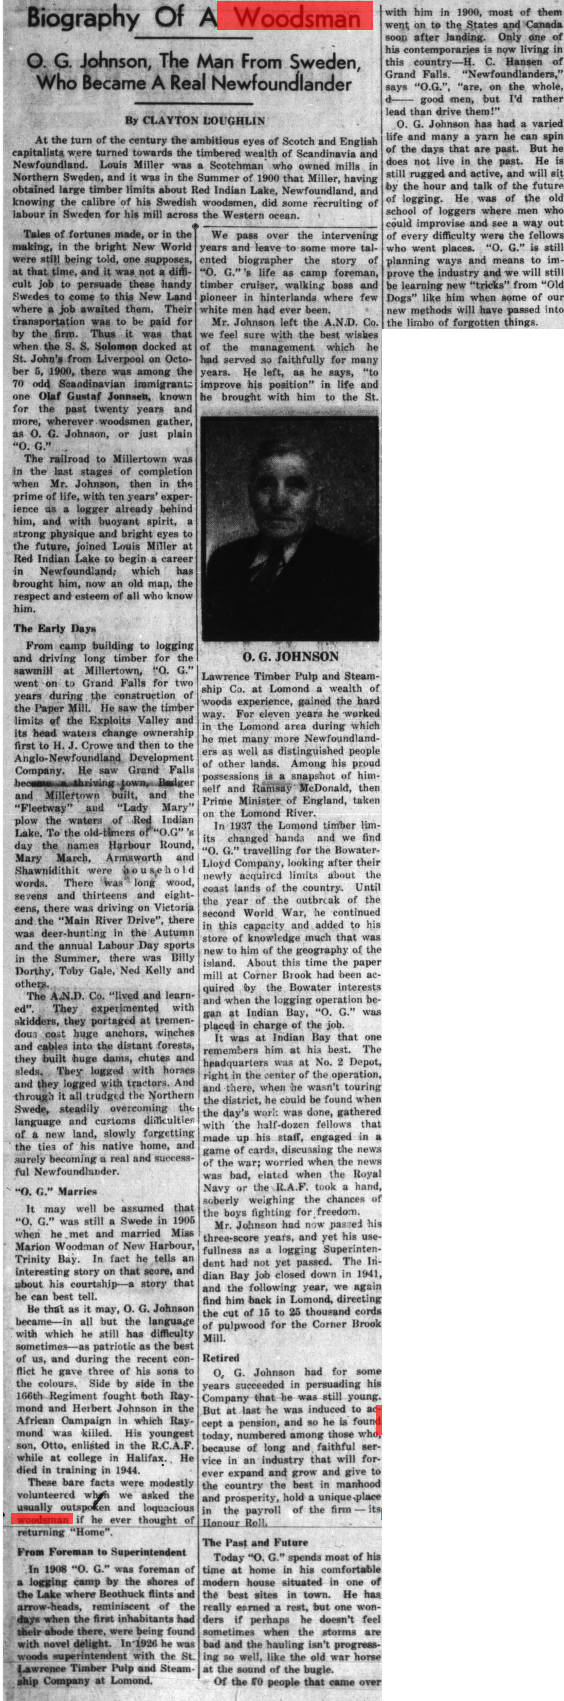 Western Star (Corner Brook, N.L.), 1947-02-07 Biography Of A Woodsman OG Johnson.jpg